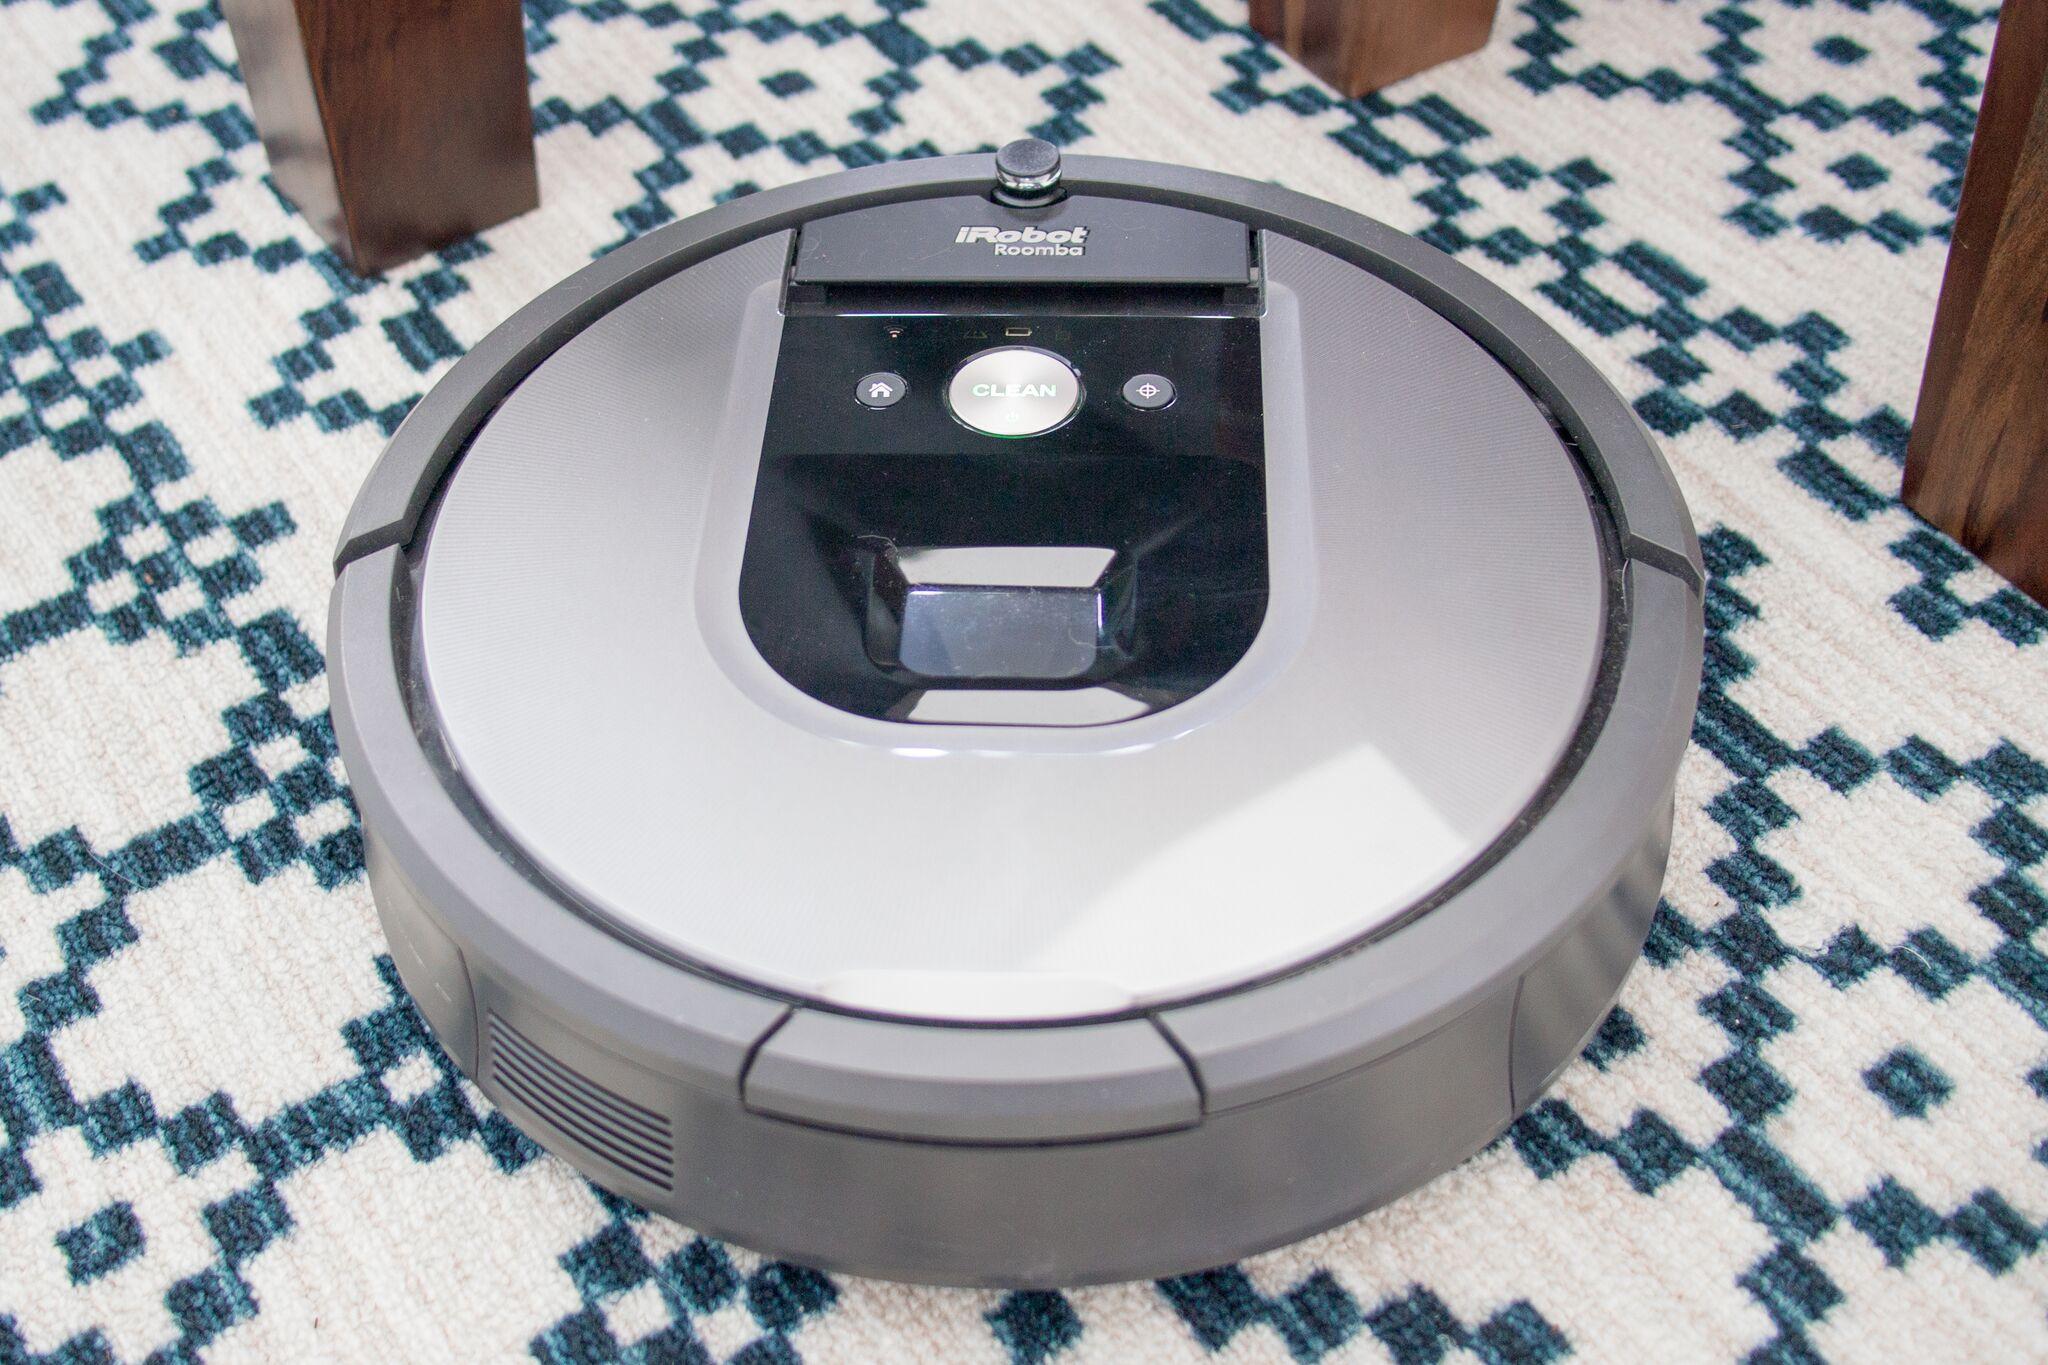 Everyday home gear made smart irobot 960 vacuum